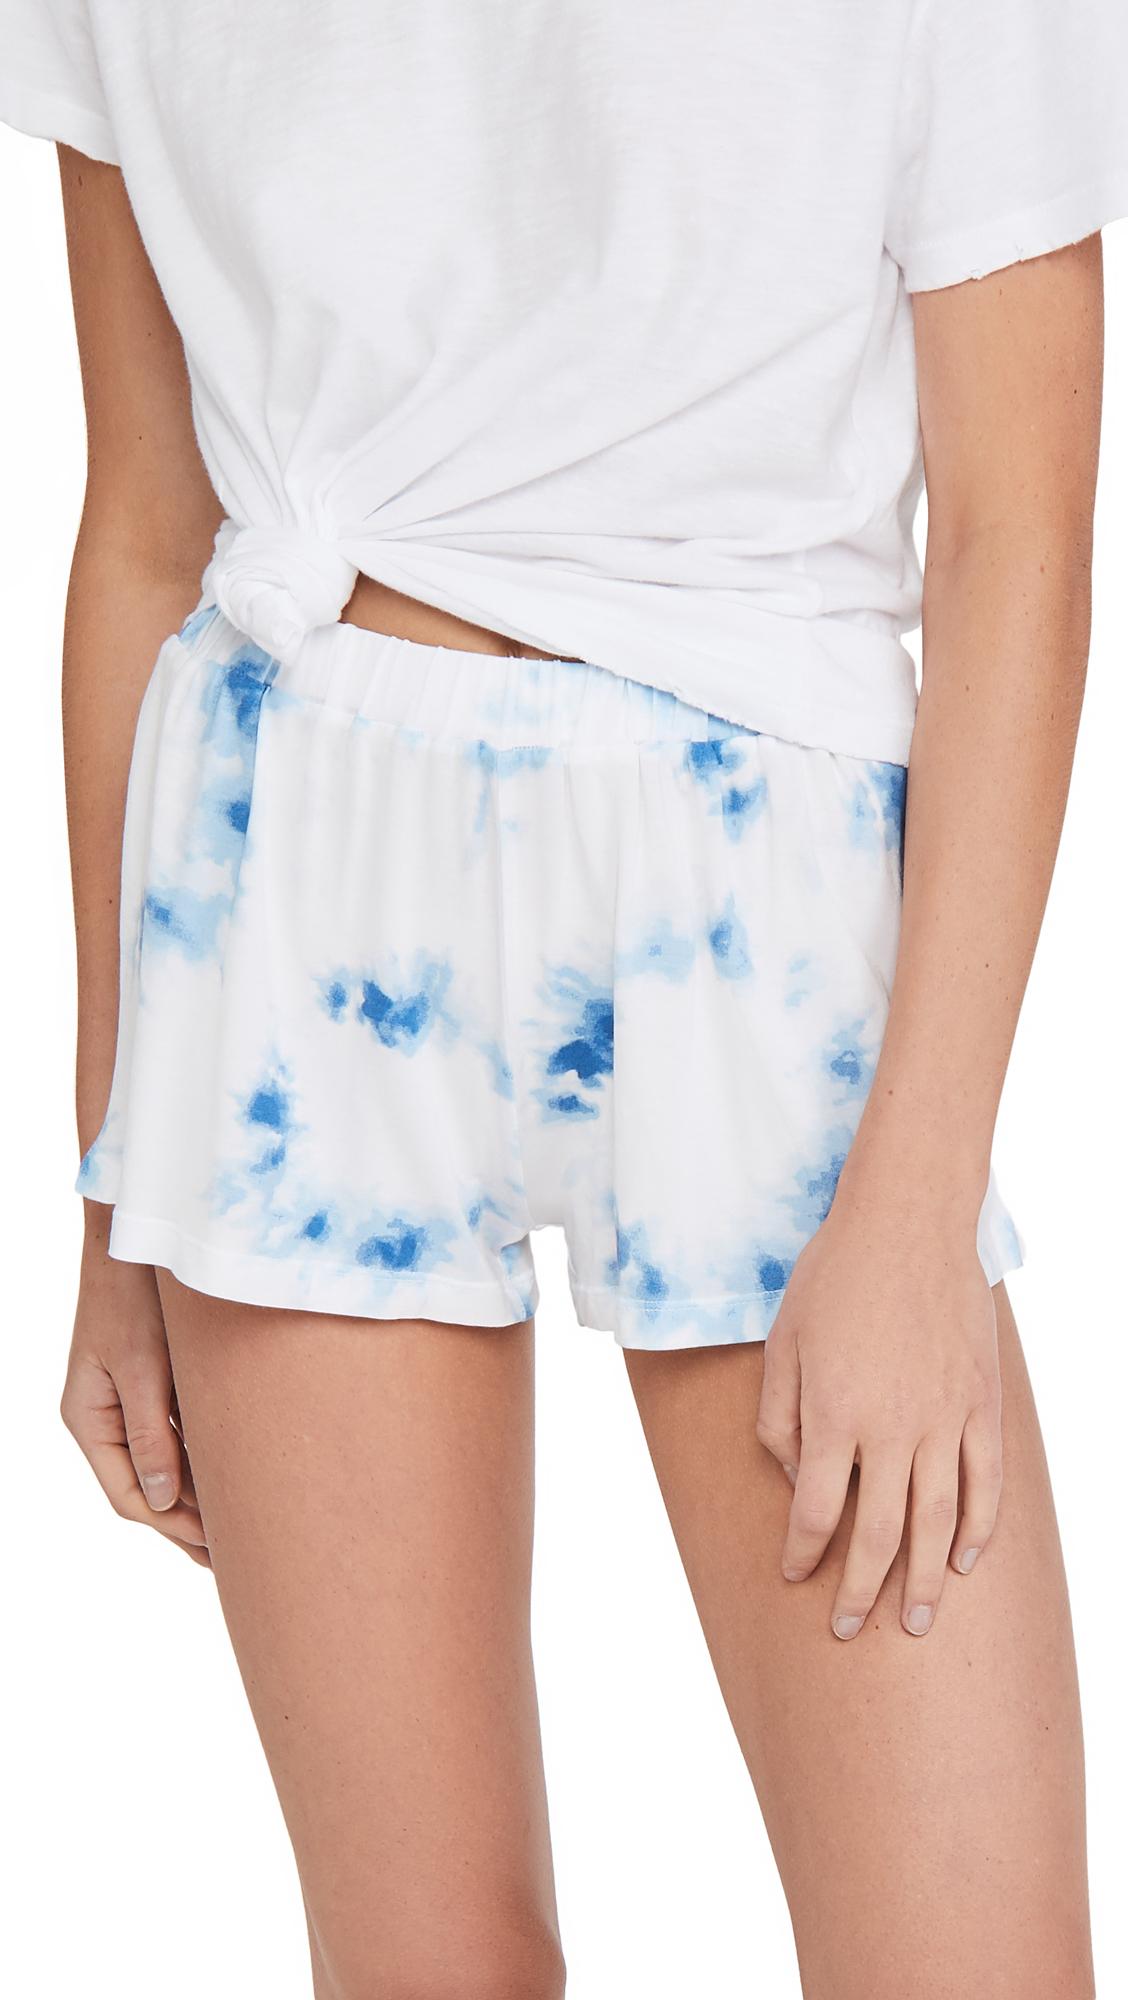 Stripe & Stare Cali Tie Dye Bed Shorts